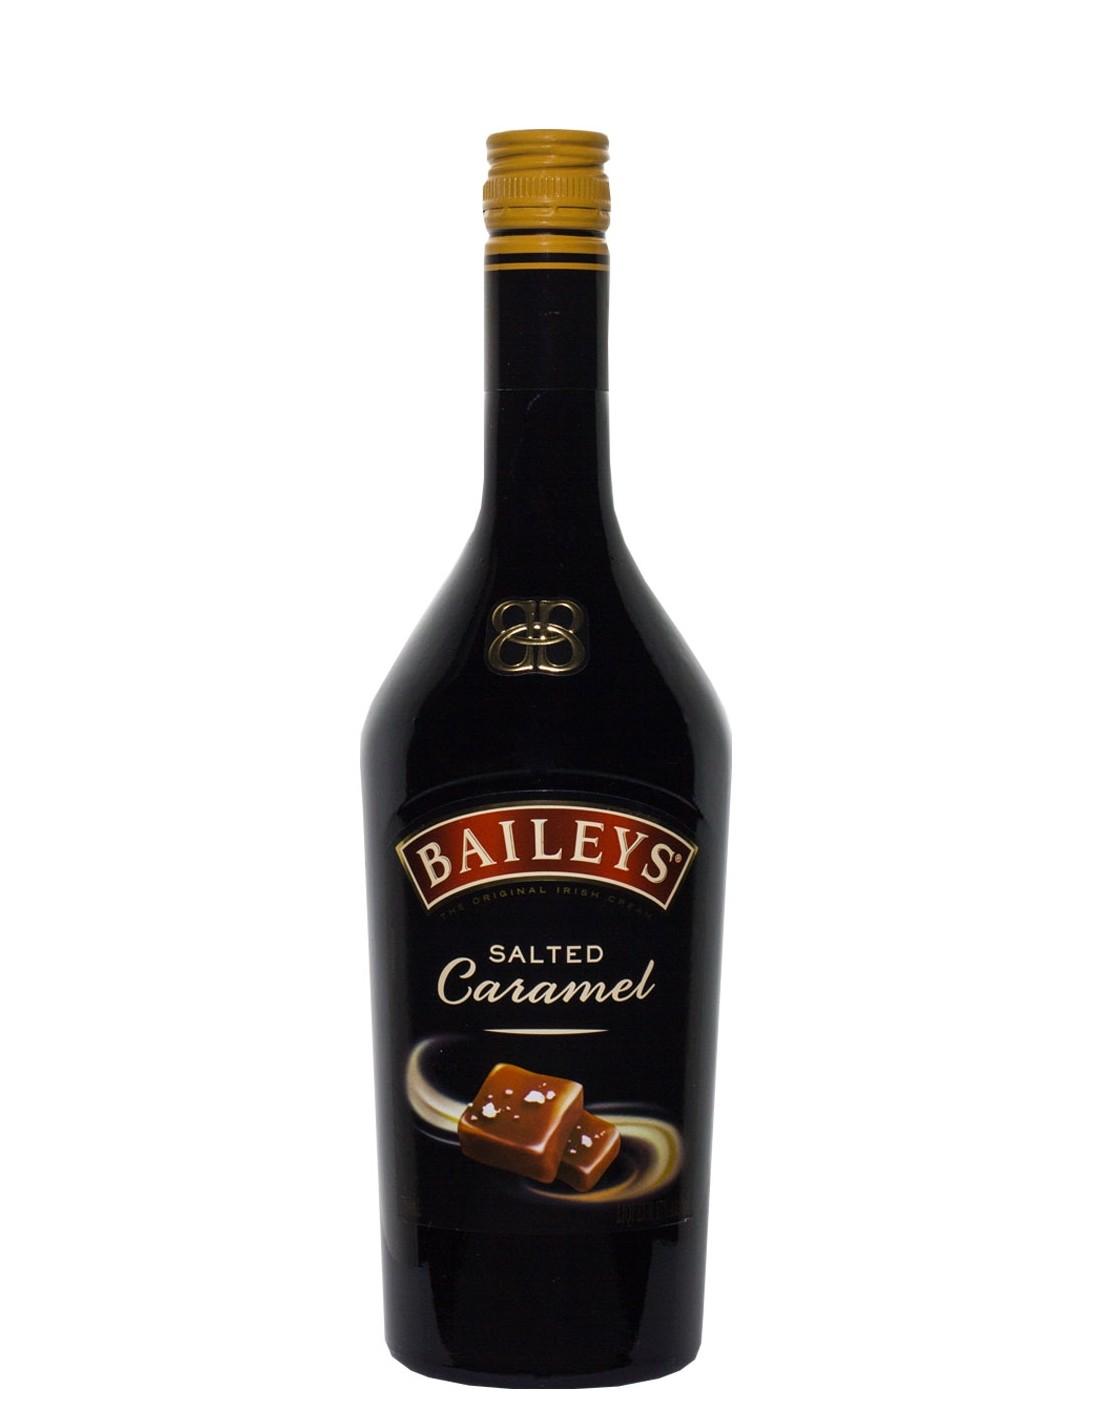 Lichior Baileys Salted Caramel, 17% alc., 0.7L, Irlanda